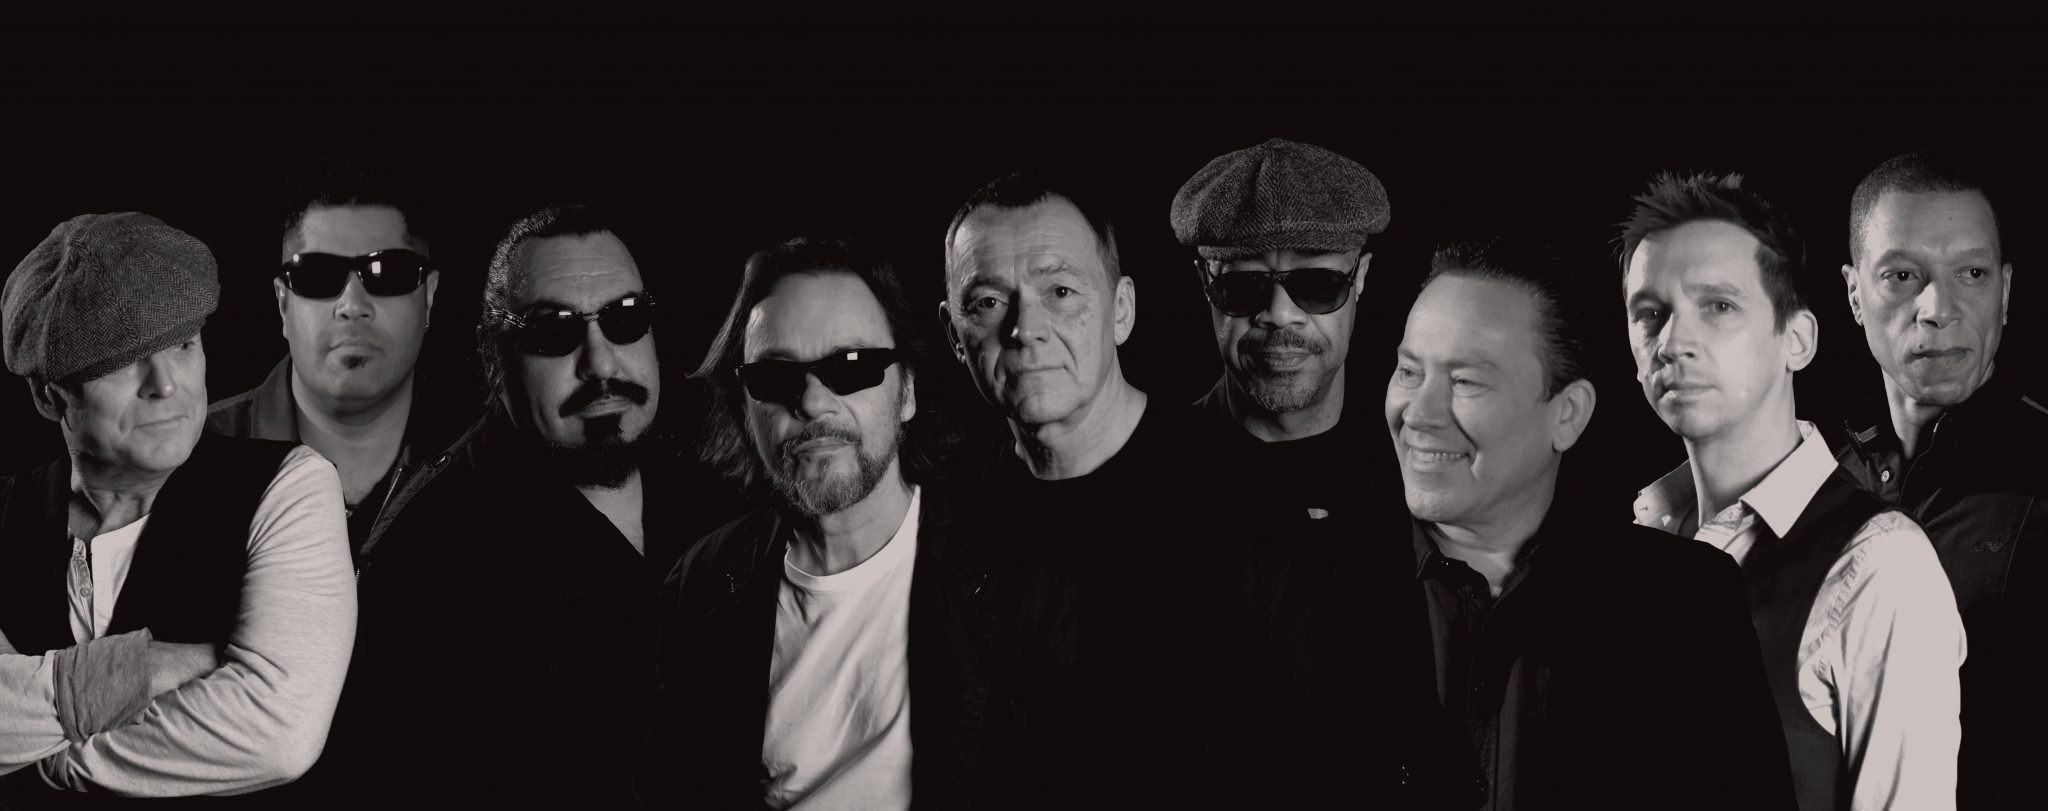 UB40 Announce Major UK Tour For 2017